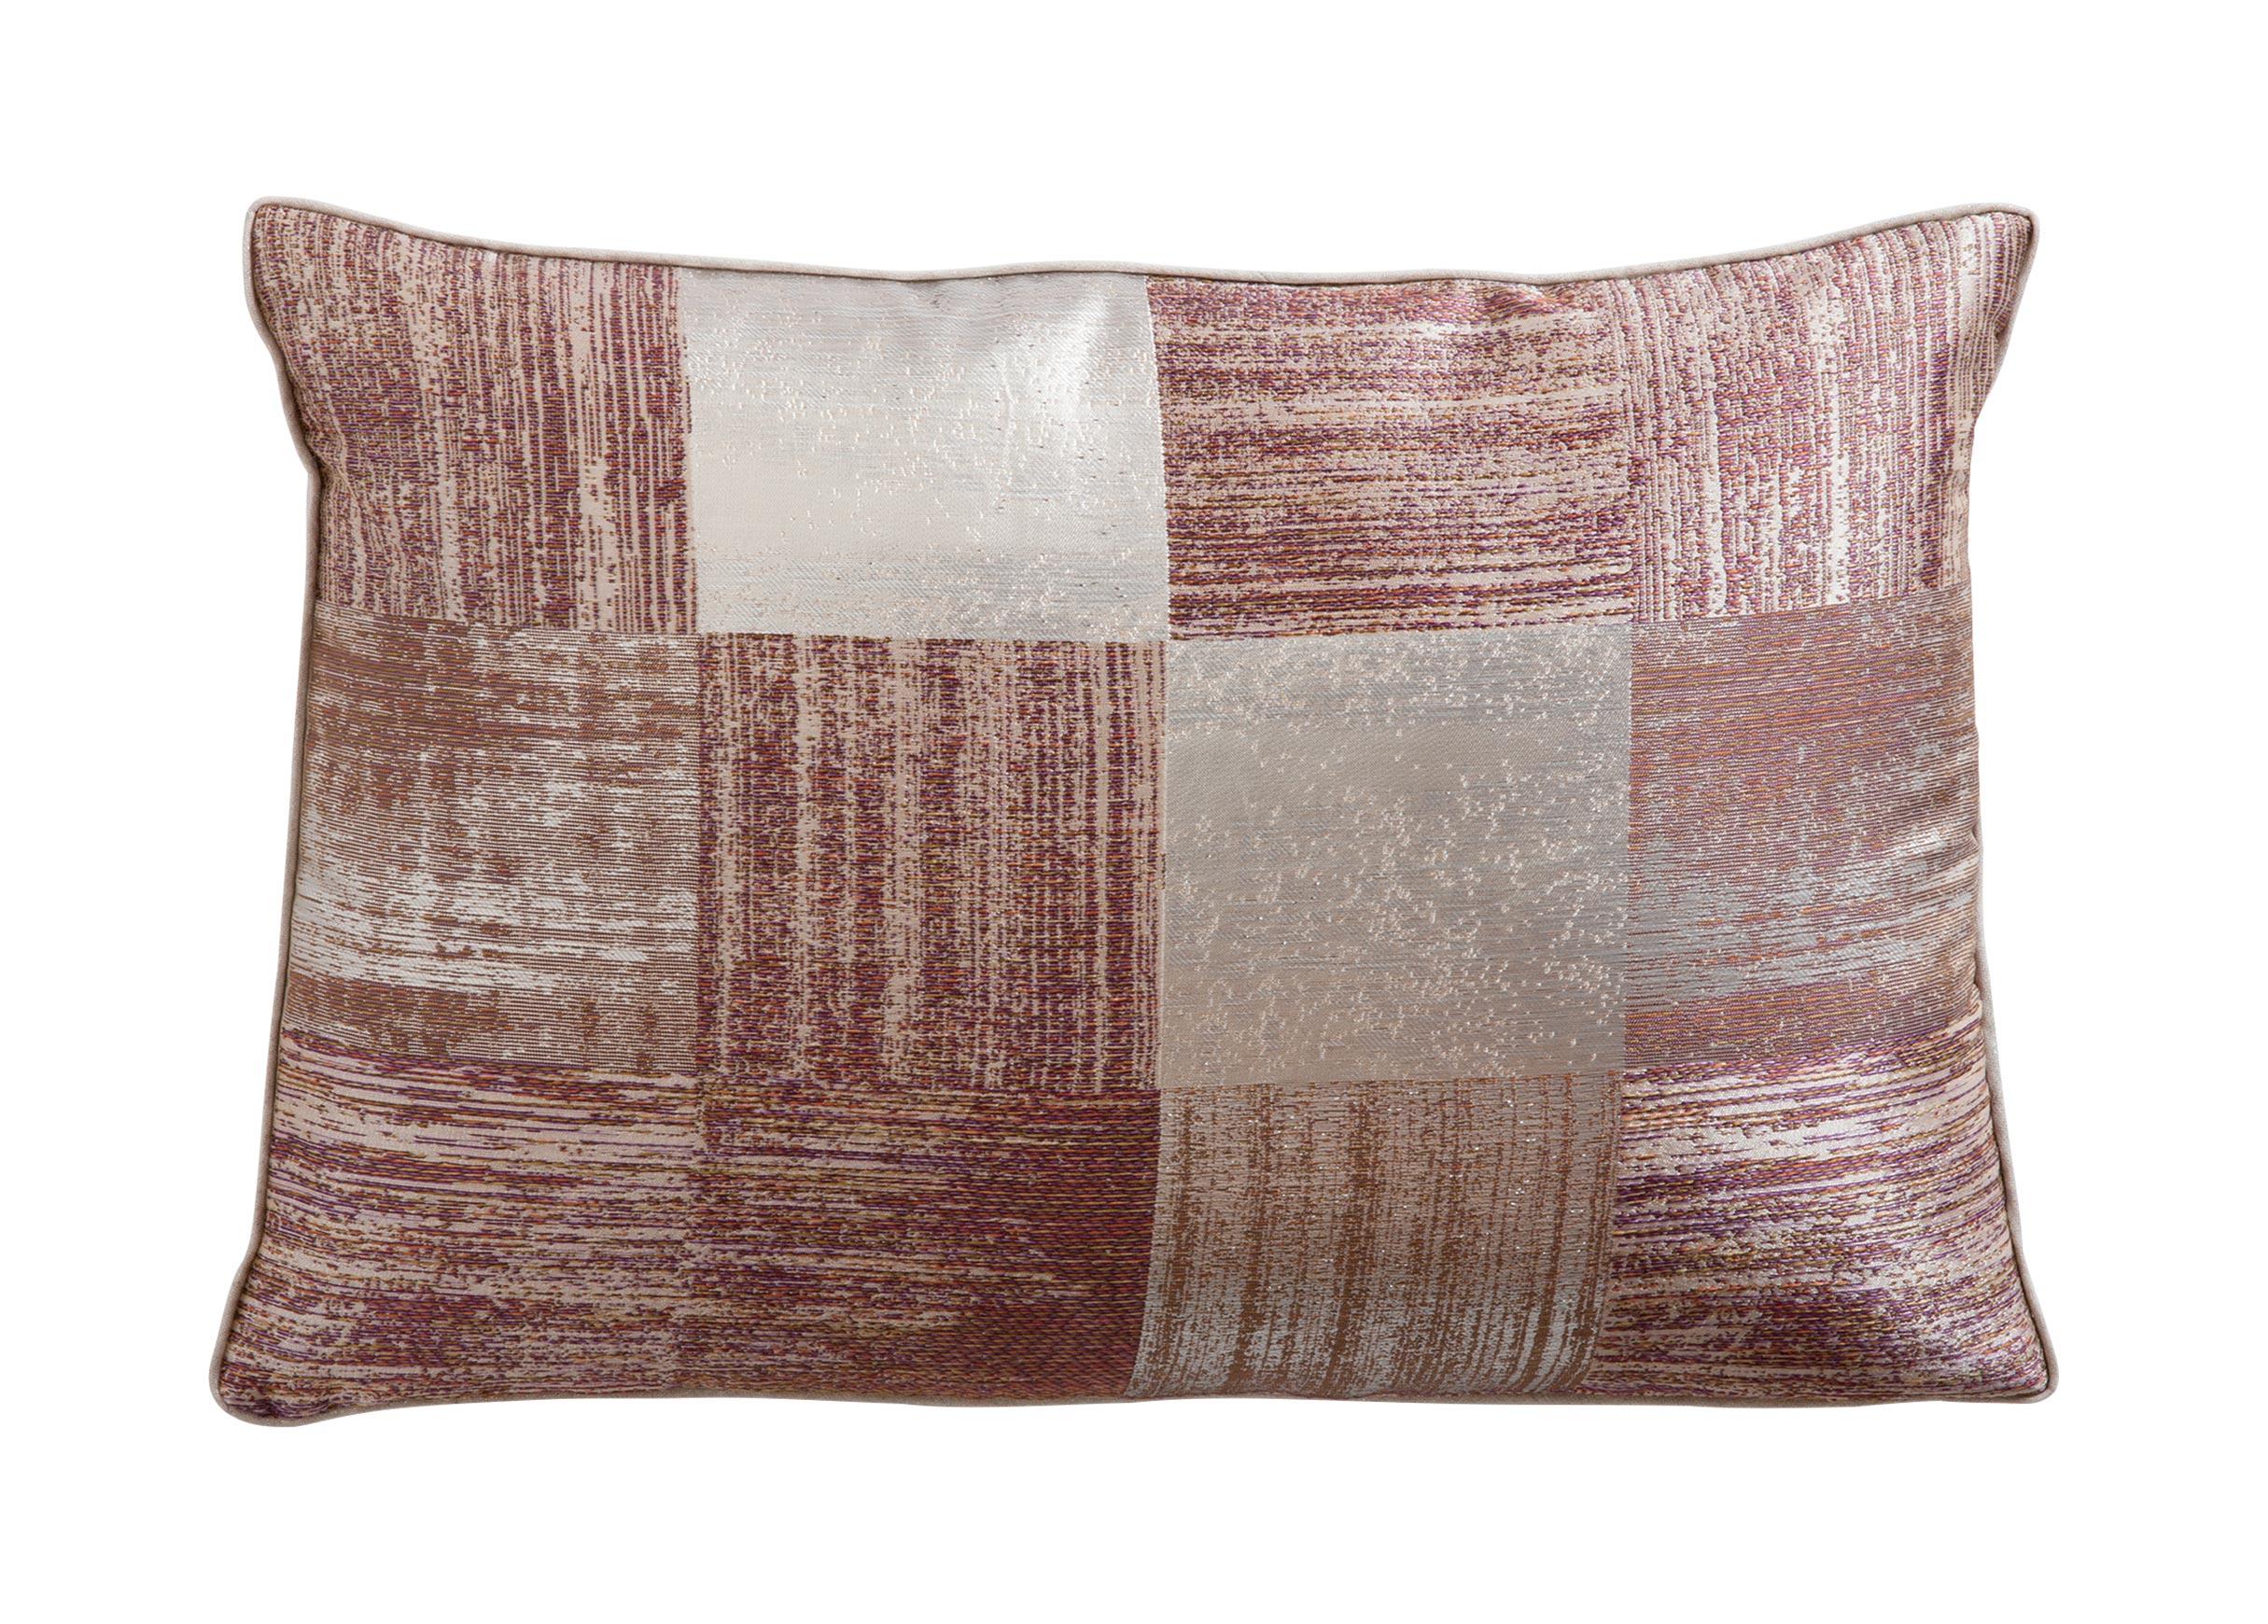 Metallic Check Lumbar Pillow Plaid Pattern Pillows